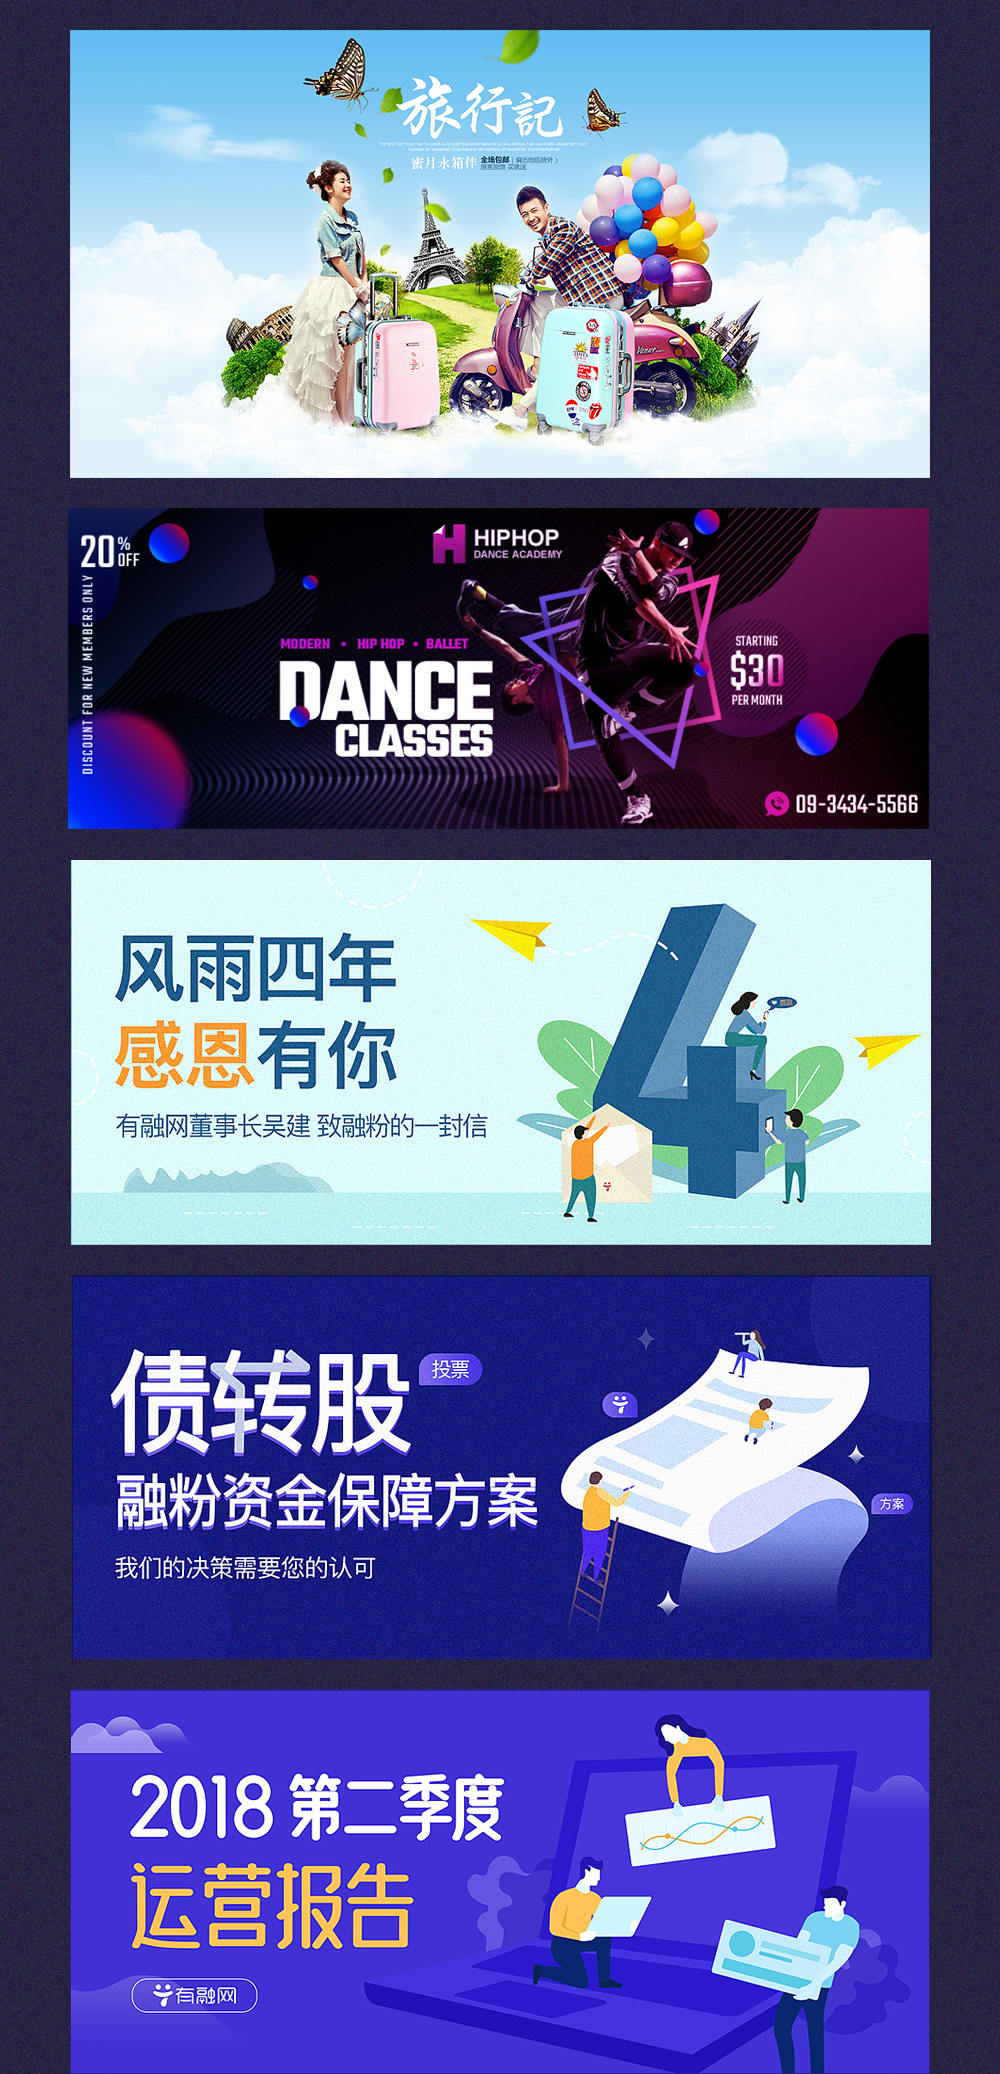 _banner设计/淘宝天猫钻展图设计/海报设计/广告图设计3